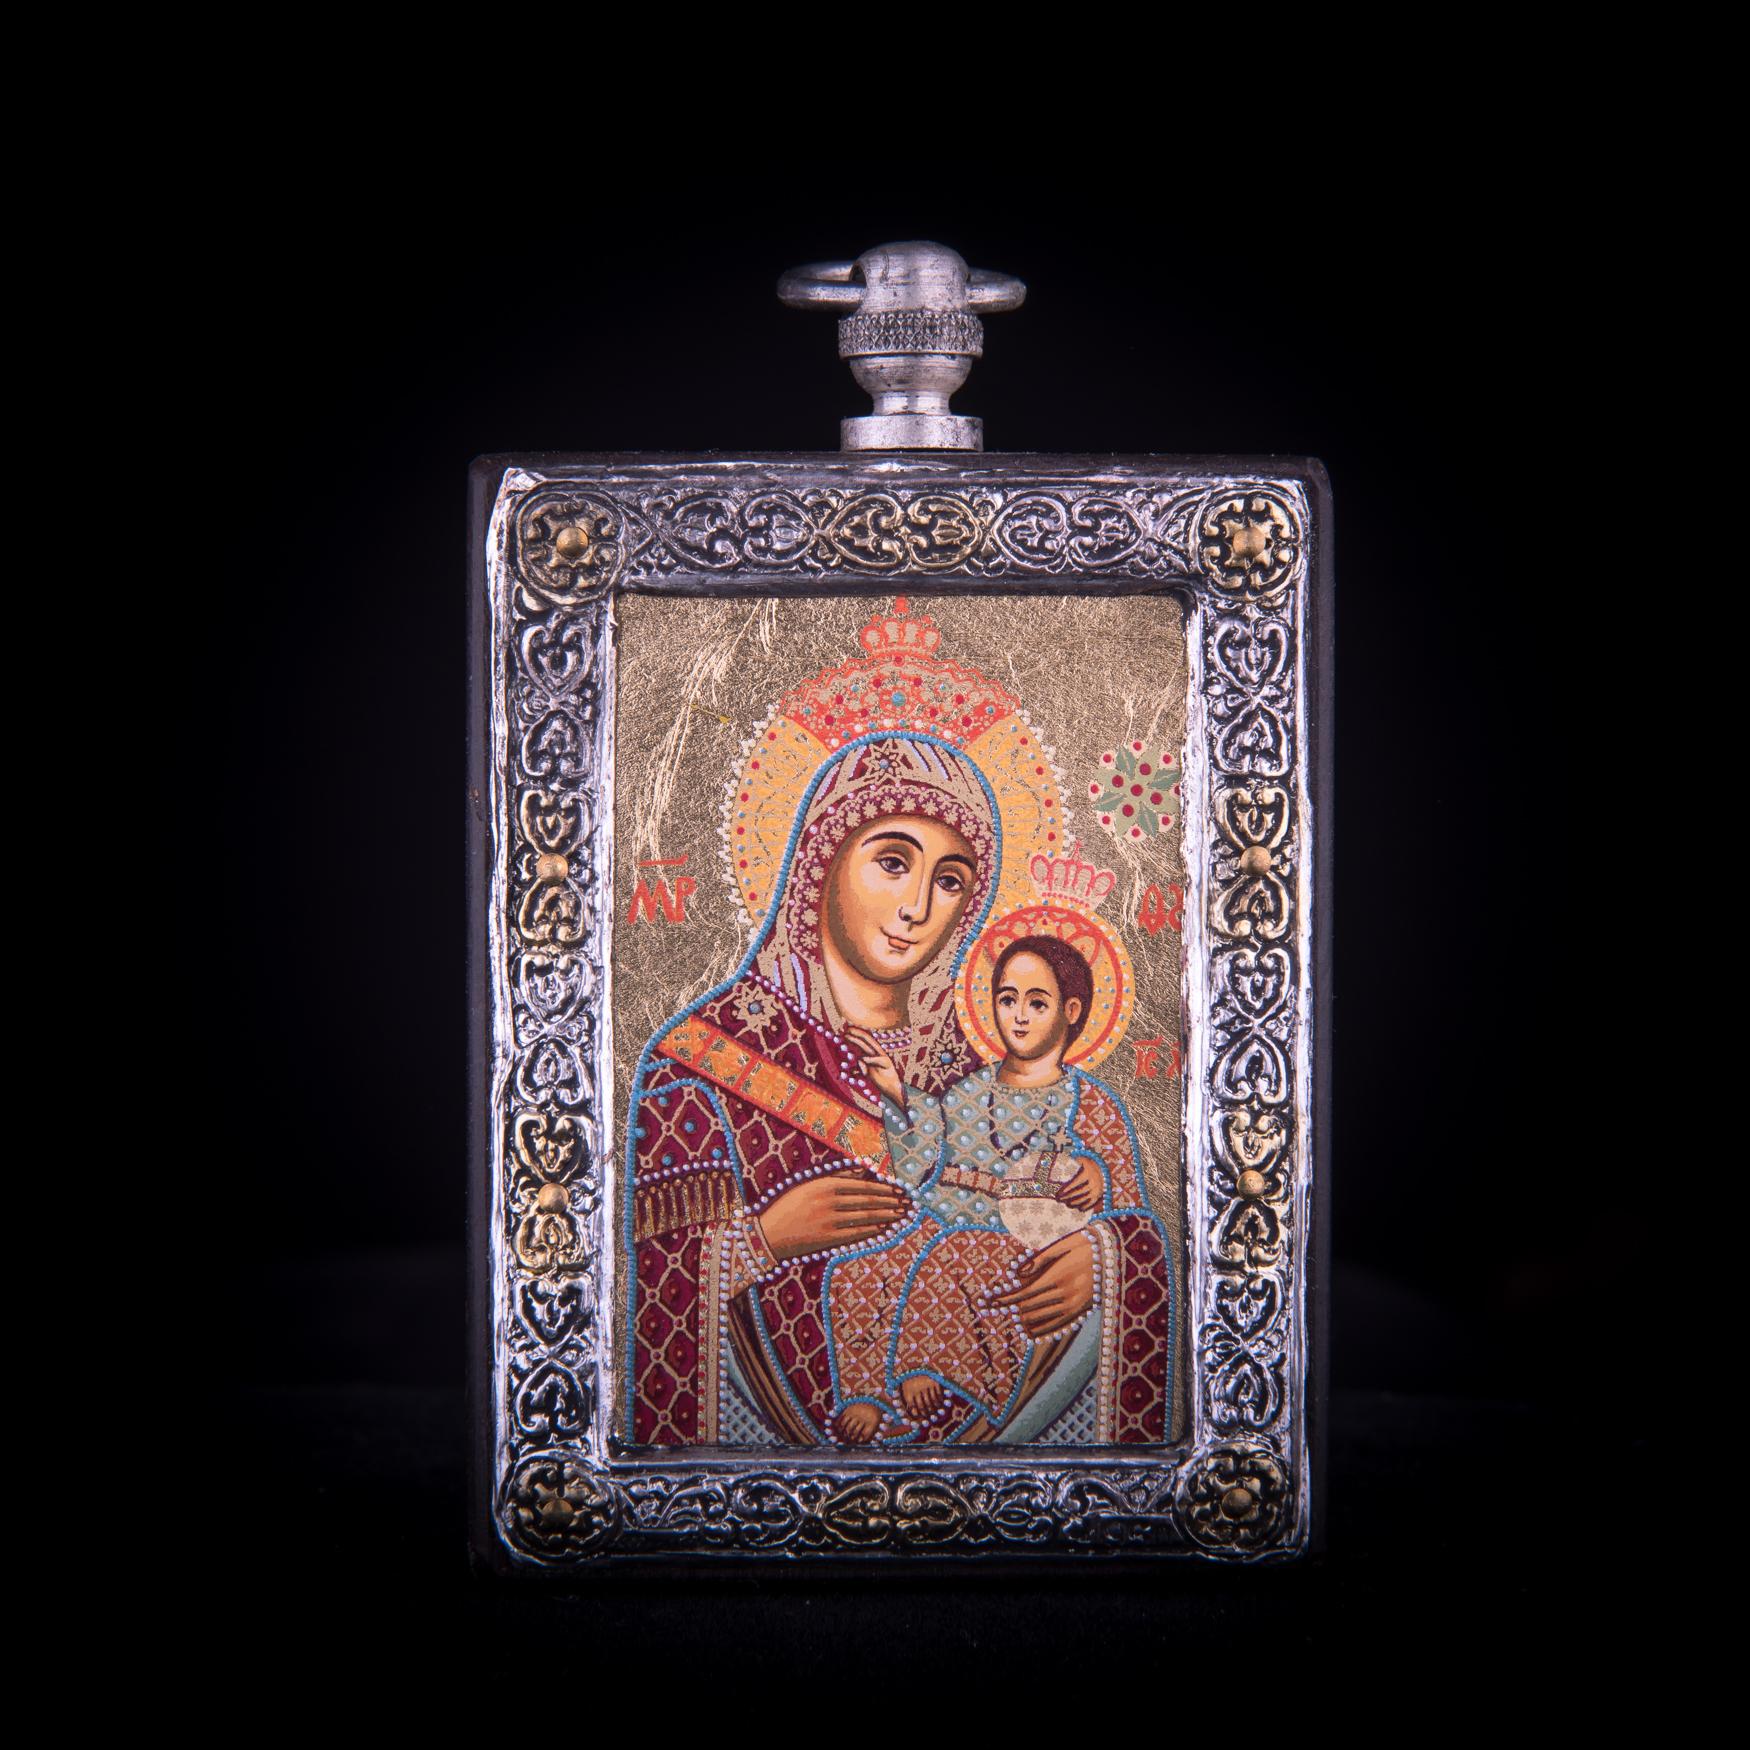 002/0024 silver icon virgin Mary of Bethlehem